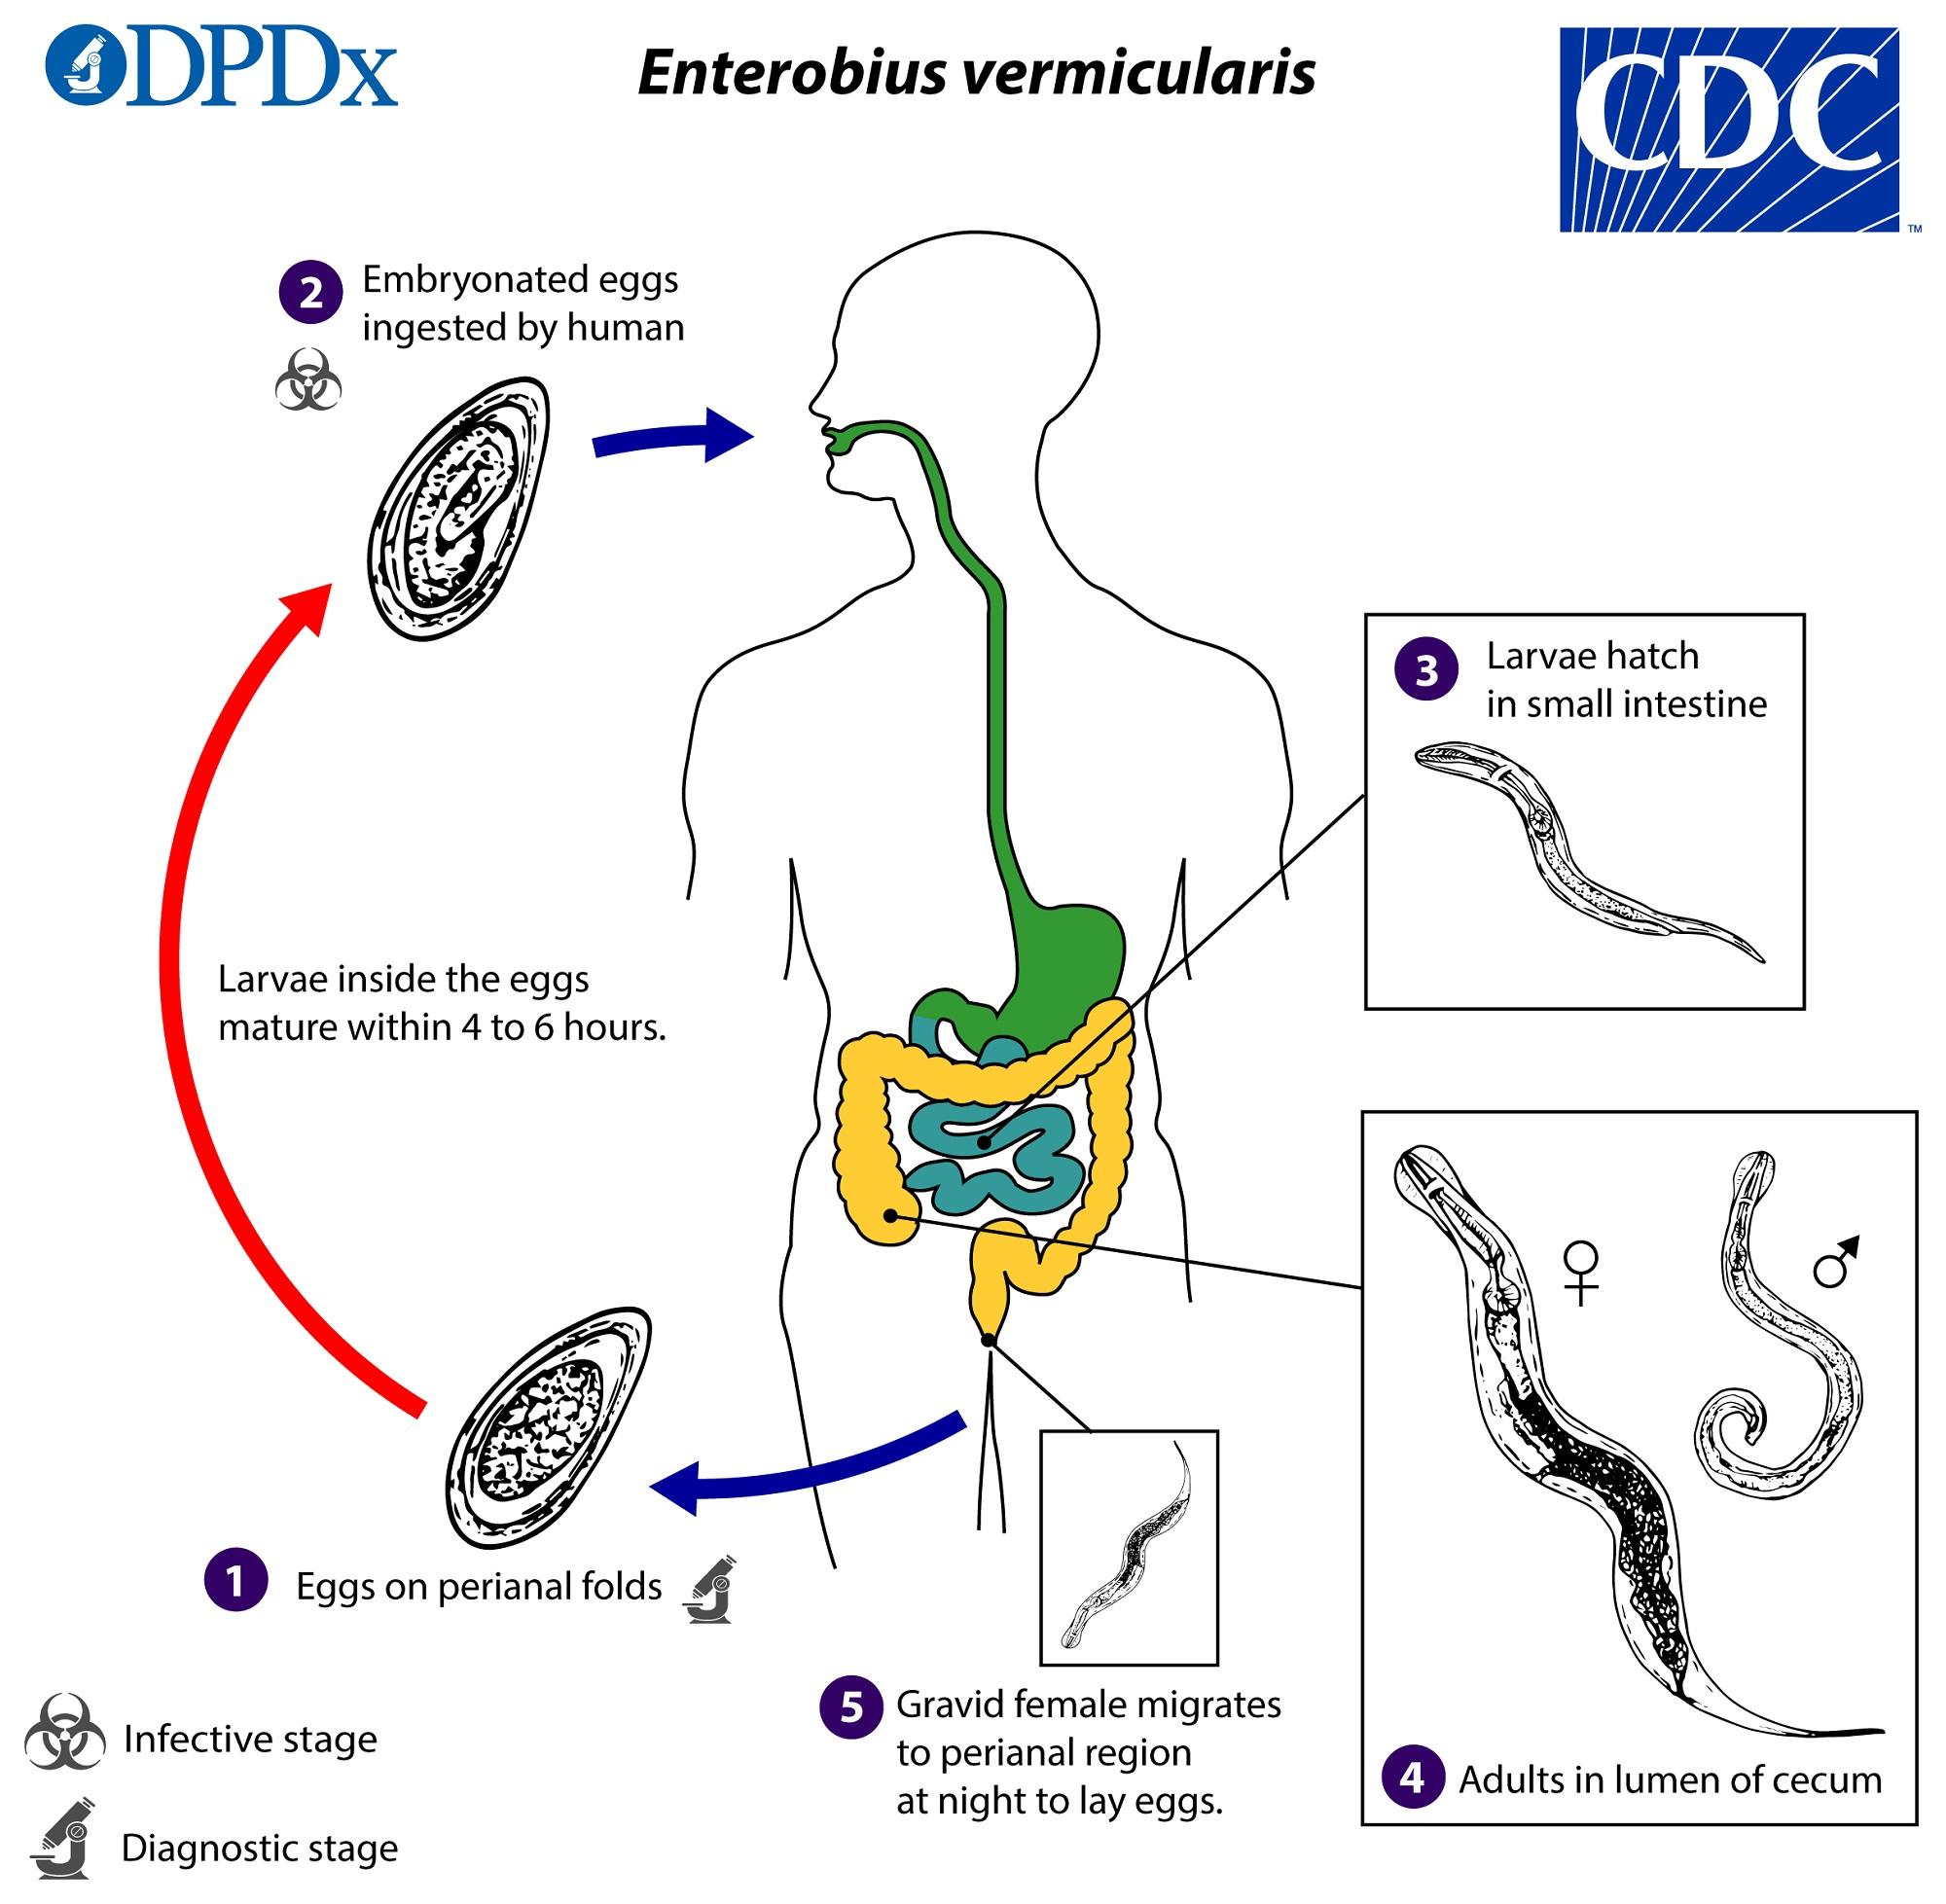 Fișier:Enterobius vermicularis asspub.ro - Wikipedia